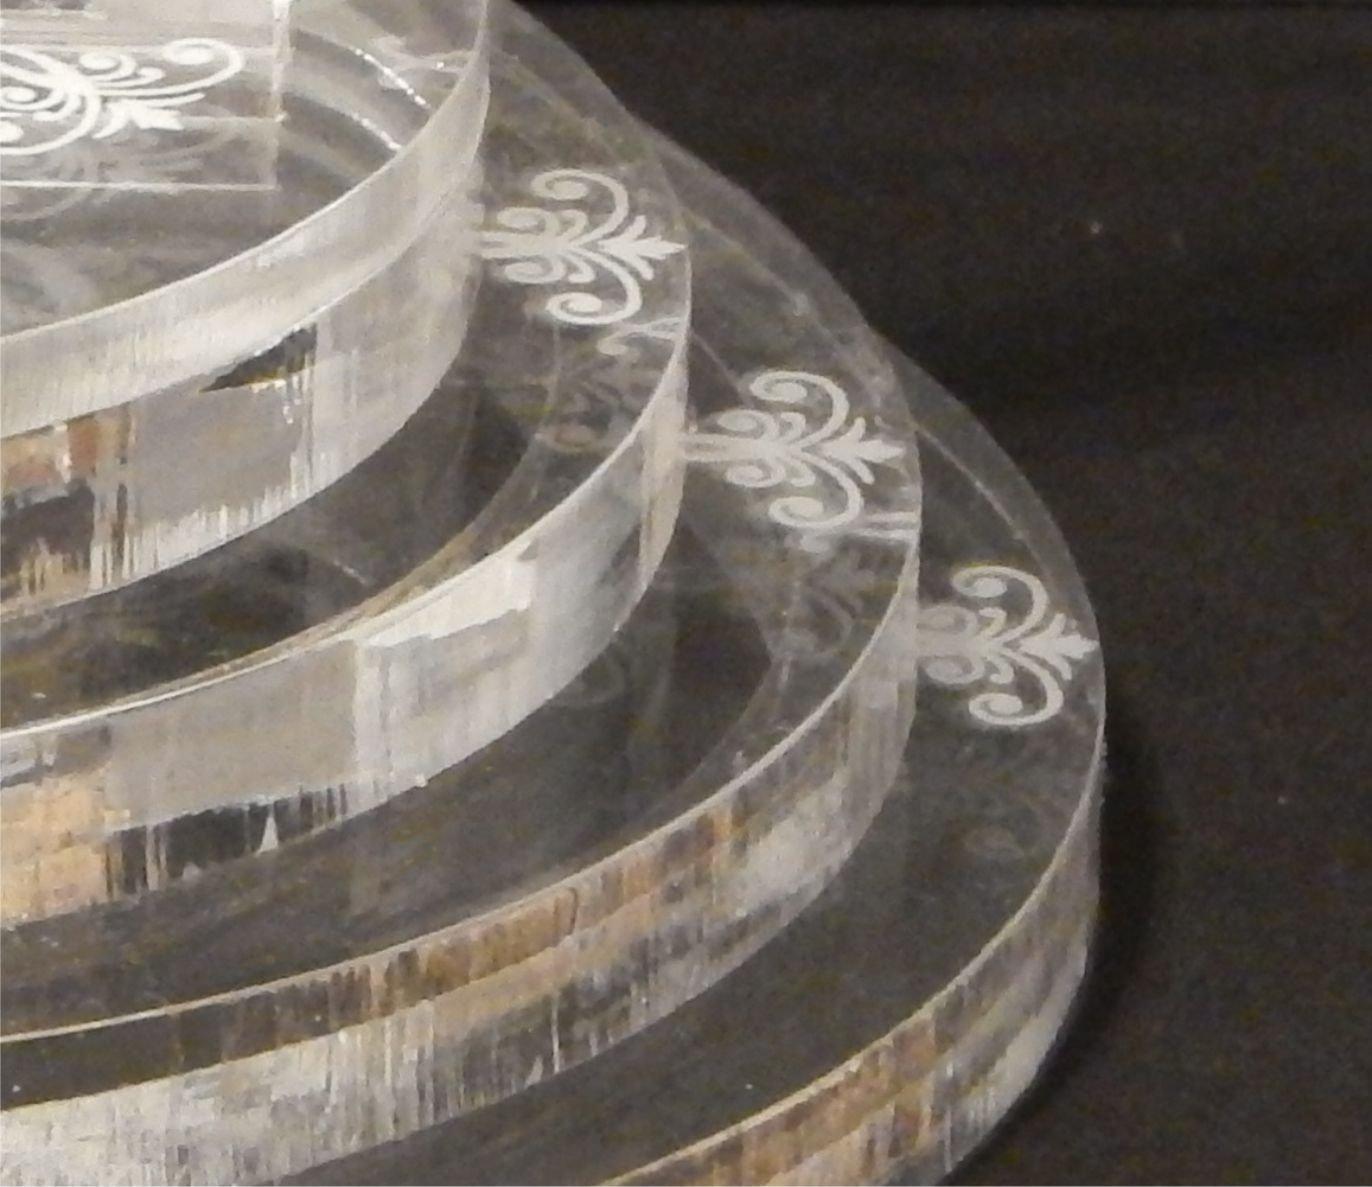 Flutes 30 Pc Las Vegas Lighted Wedding Cake Topper  Acrylic Key Chain Favors